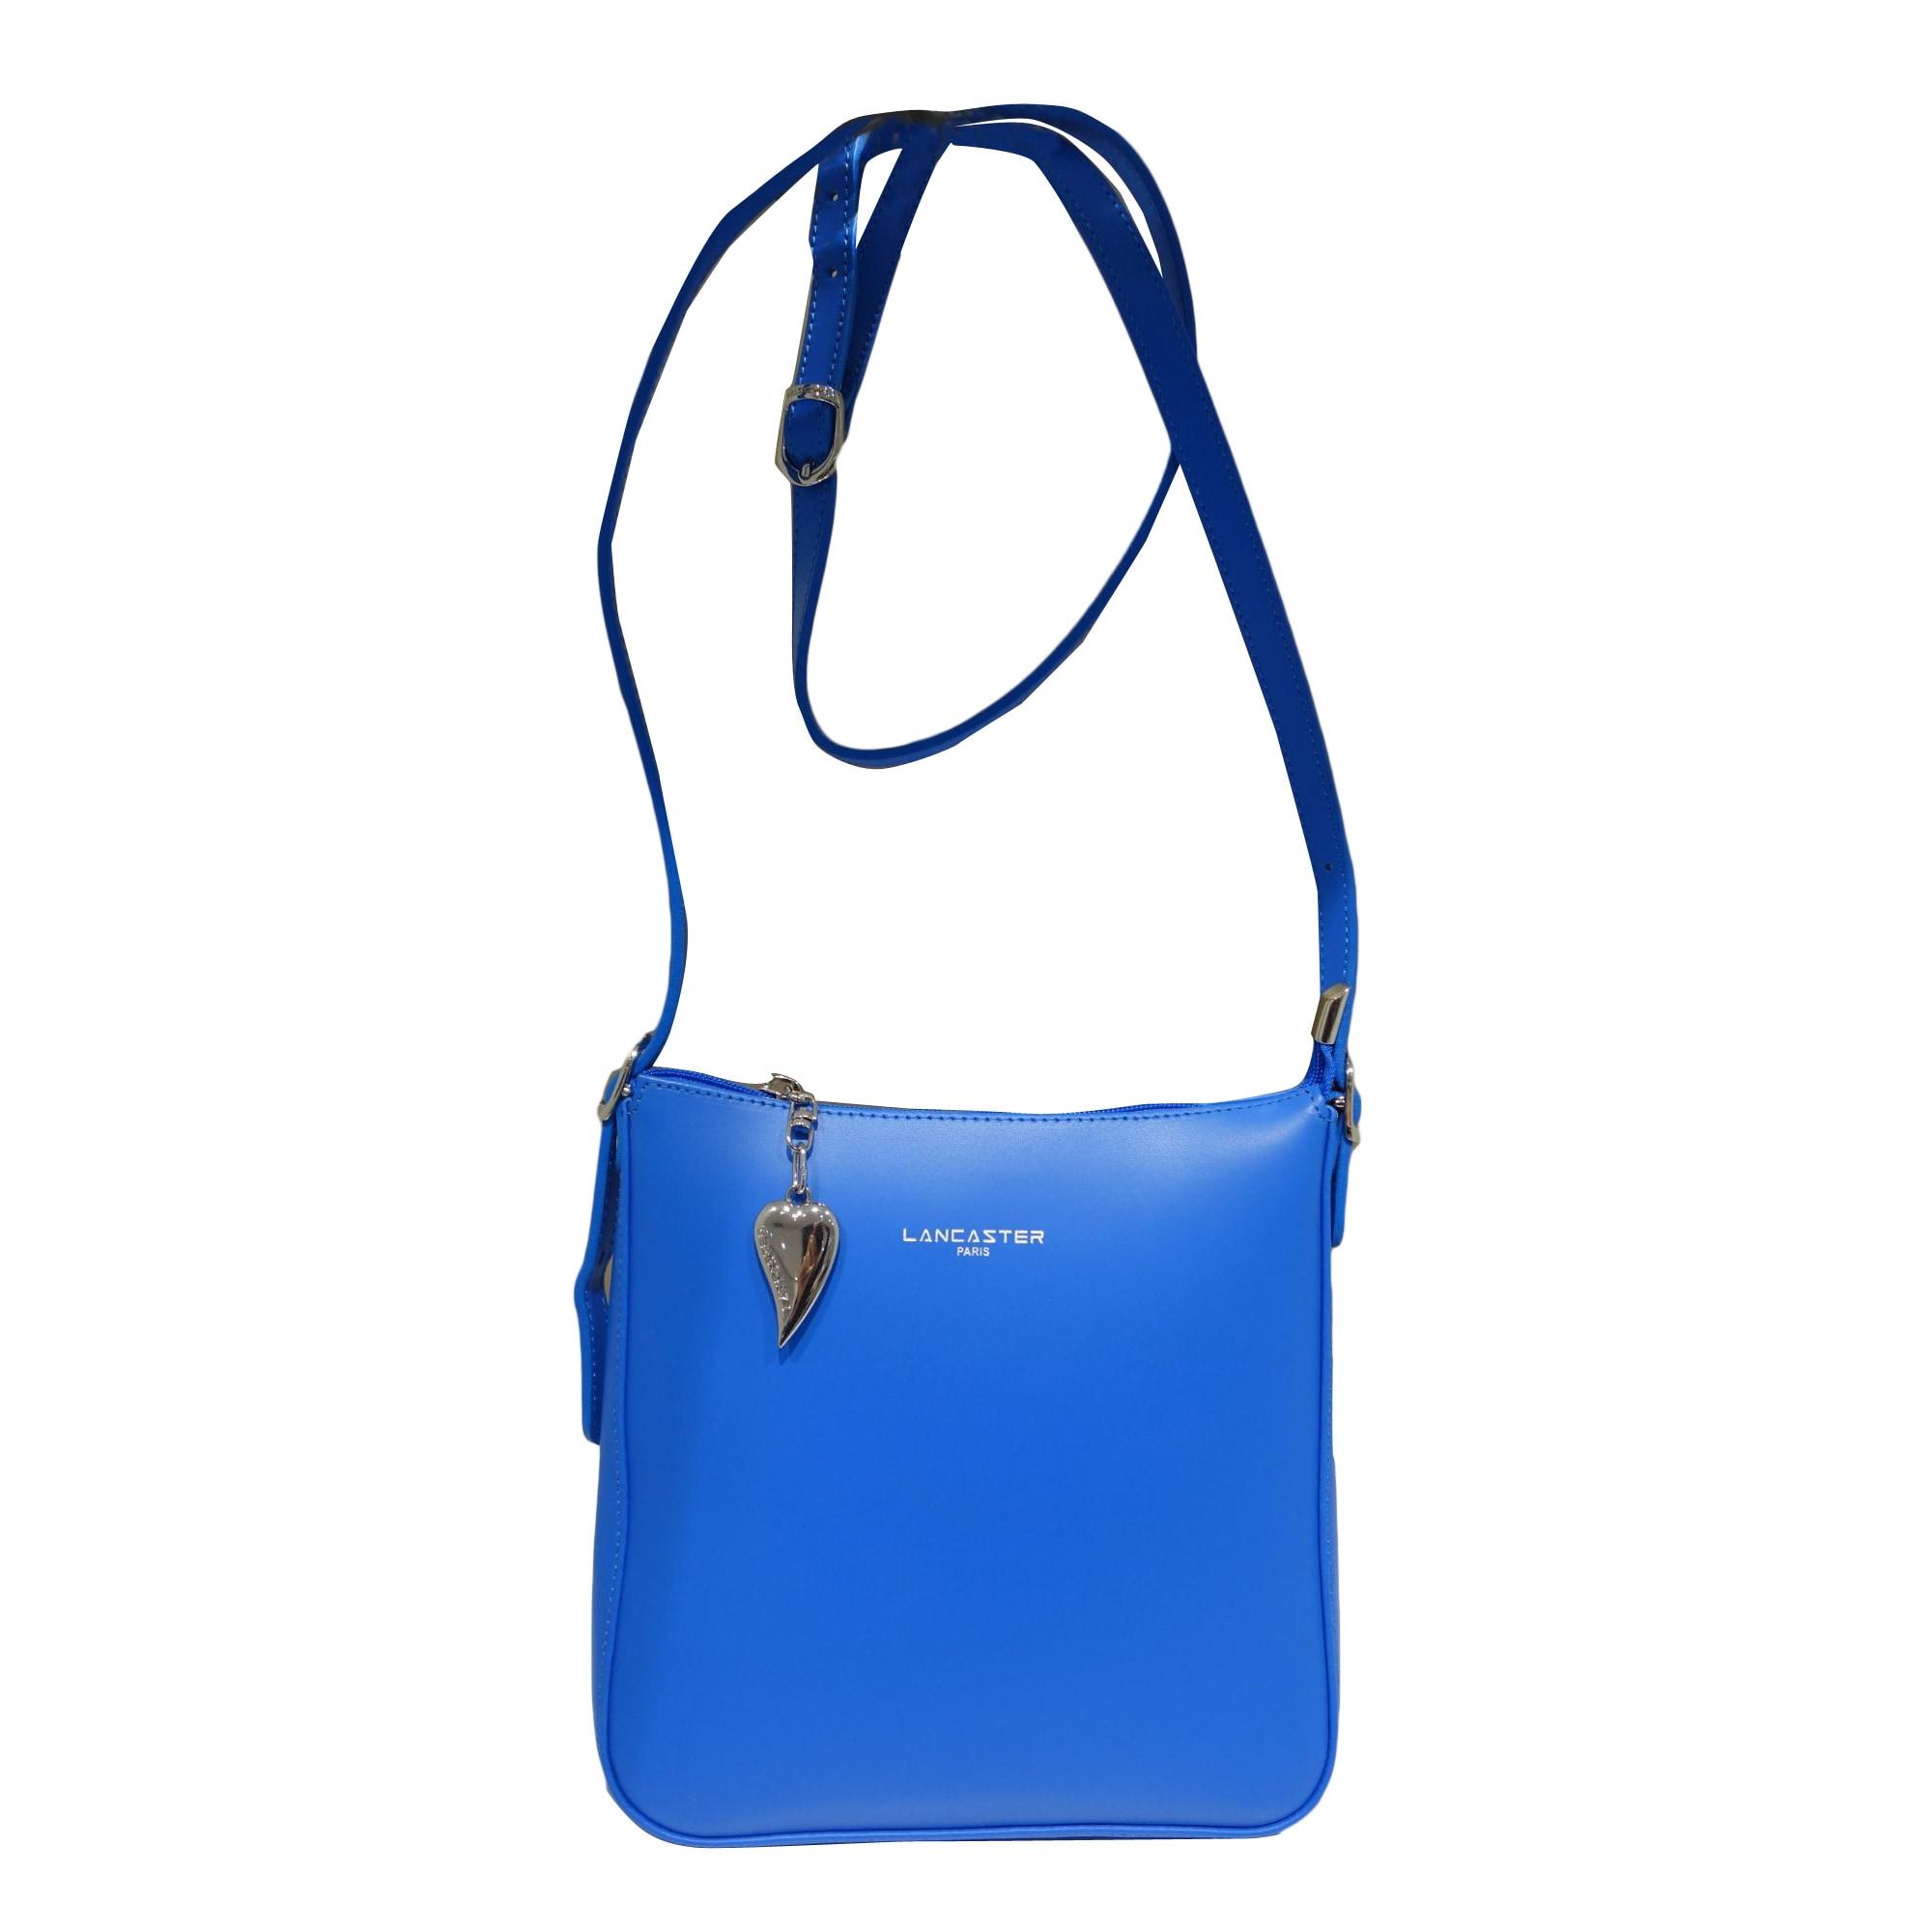 8694078 Cuir Sac En Lancaster Bandoulière Bleu zVjpqGLSUM